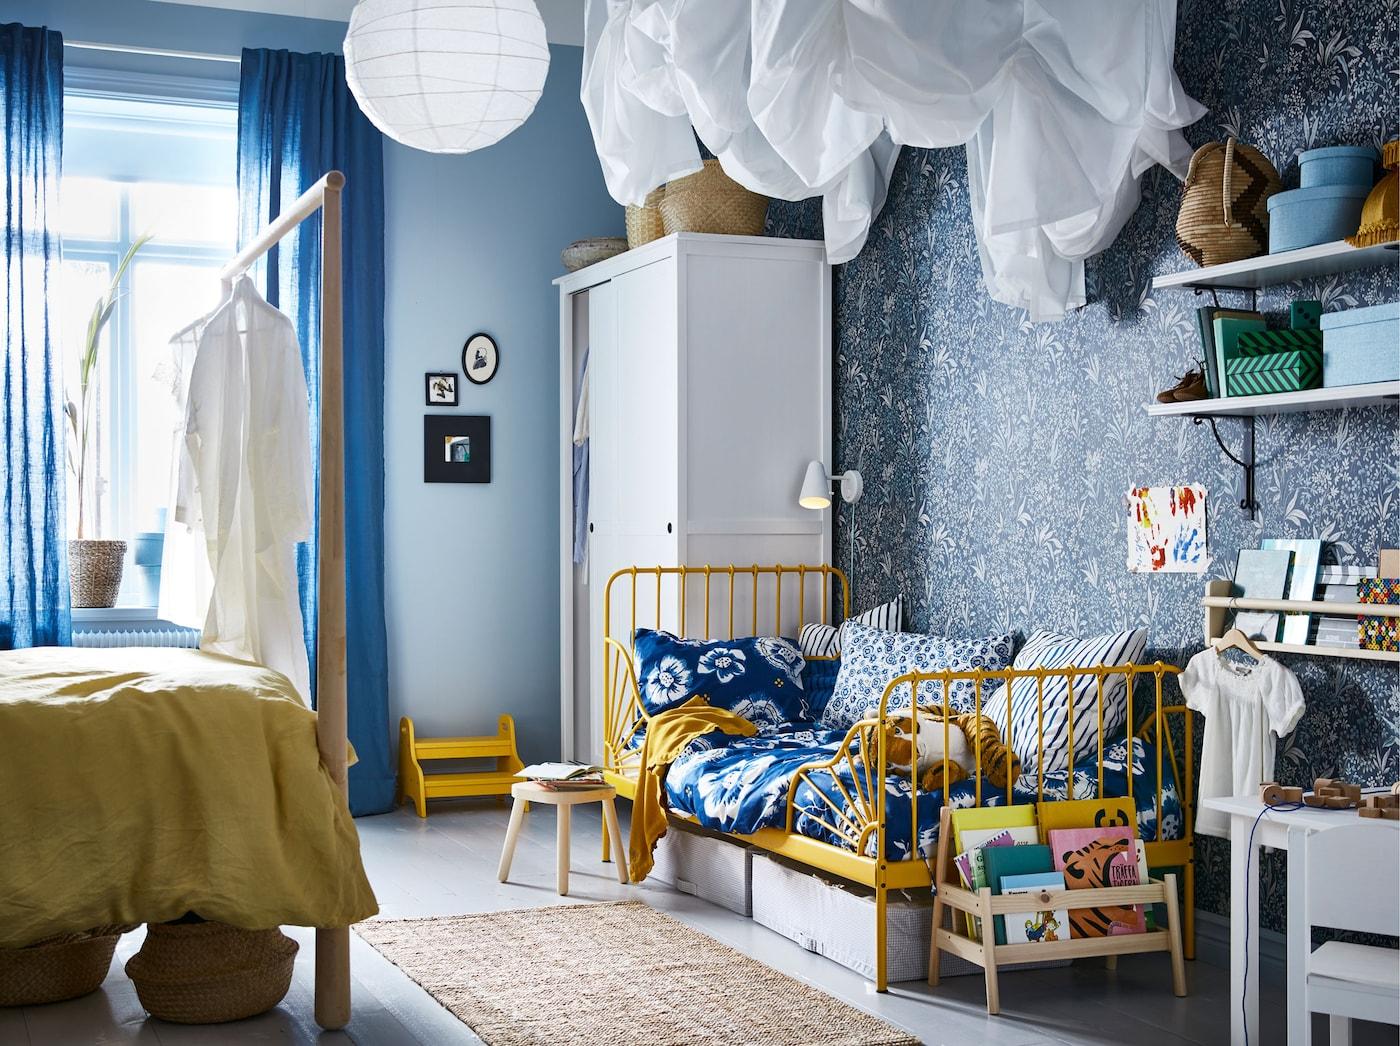 IKEA MINNEN kinderbed babybed kinderkledingkasten kinderkamerverlichting kinderkamer